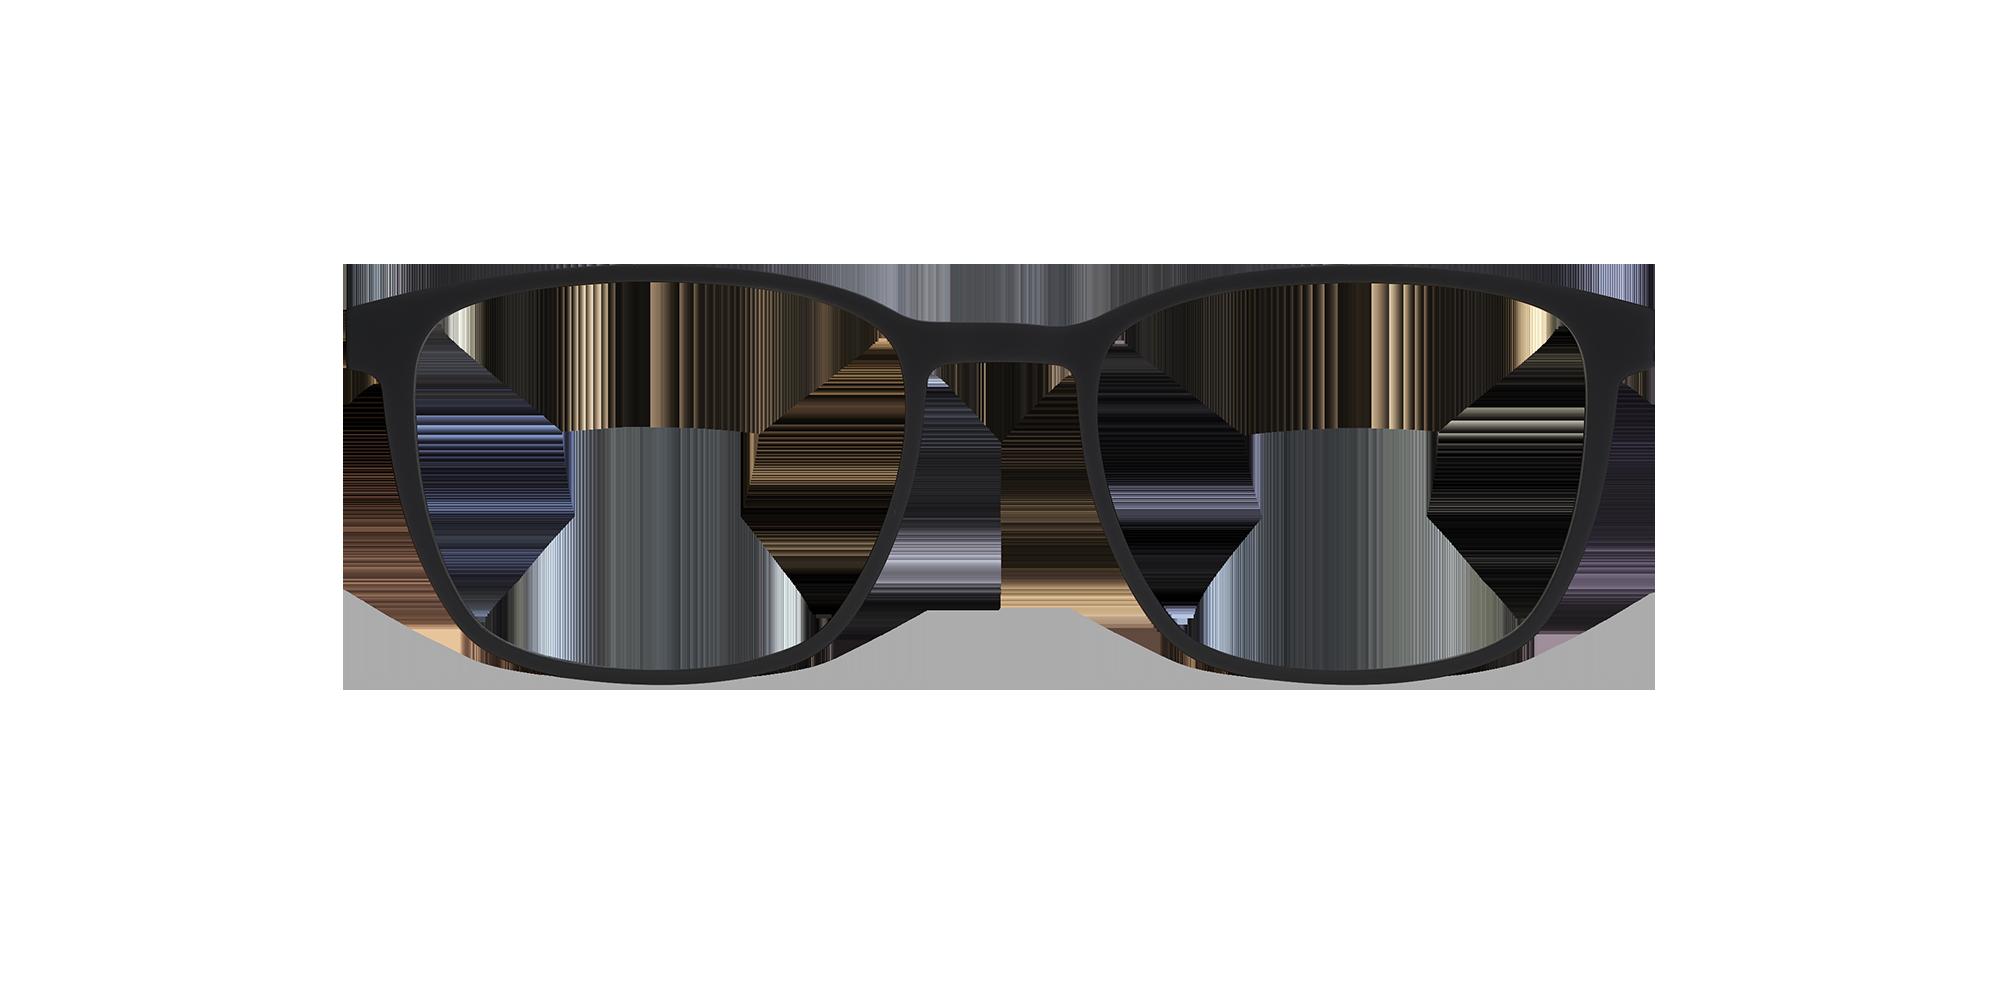 afflelou/france/products/smart_clip/clips_glasses/TMK42BBBK015319.png